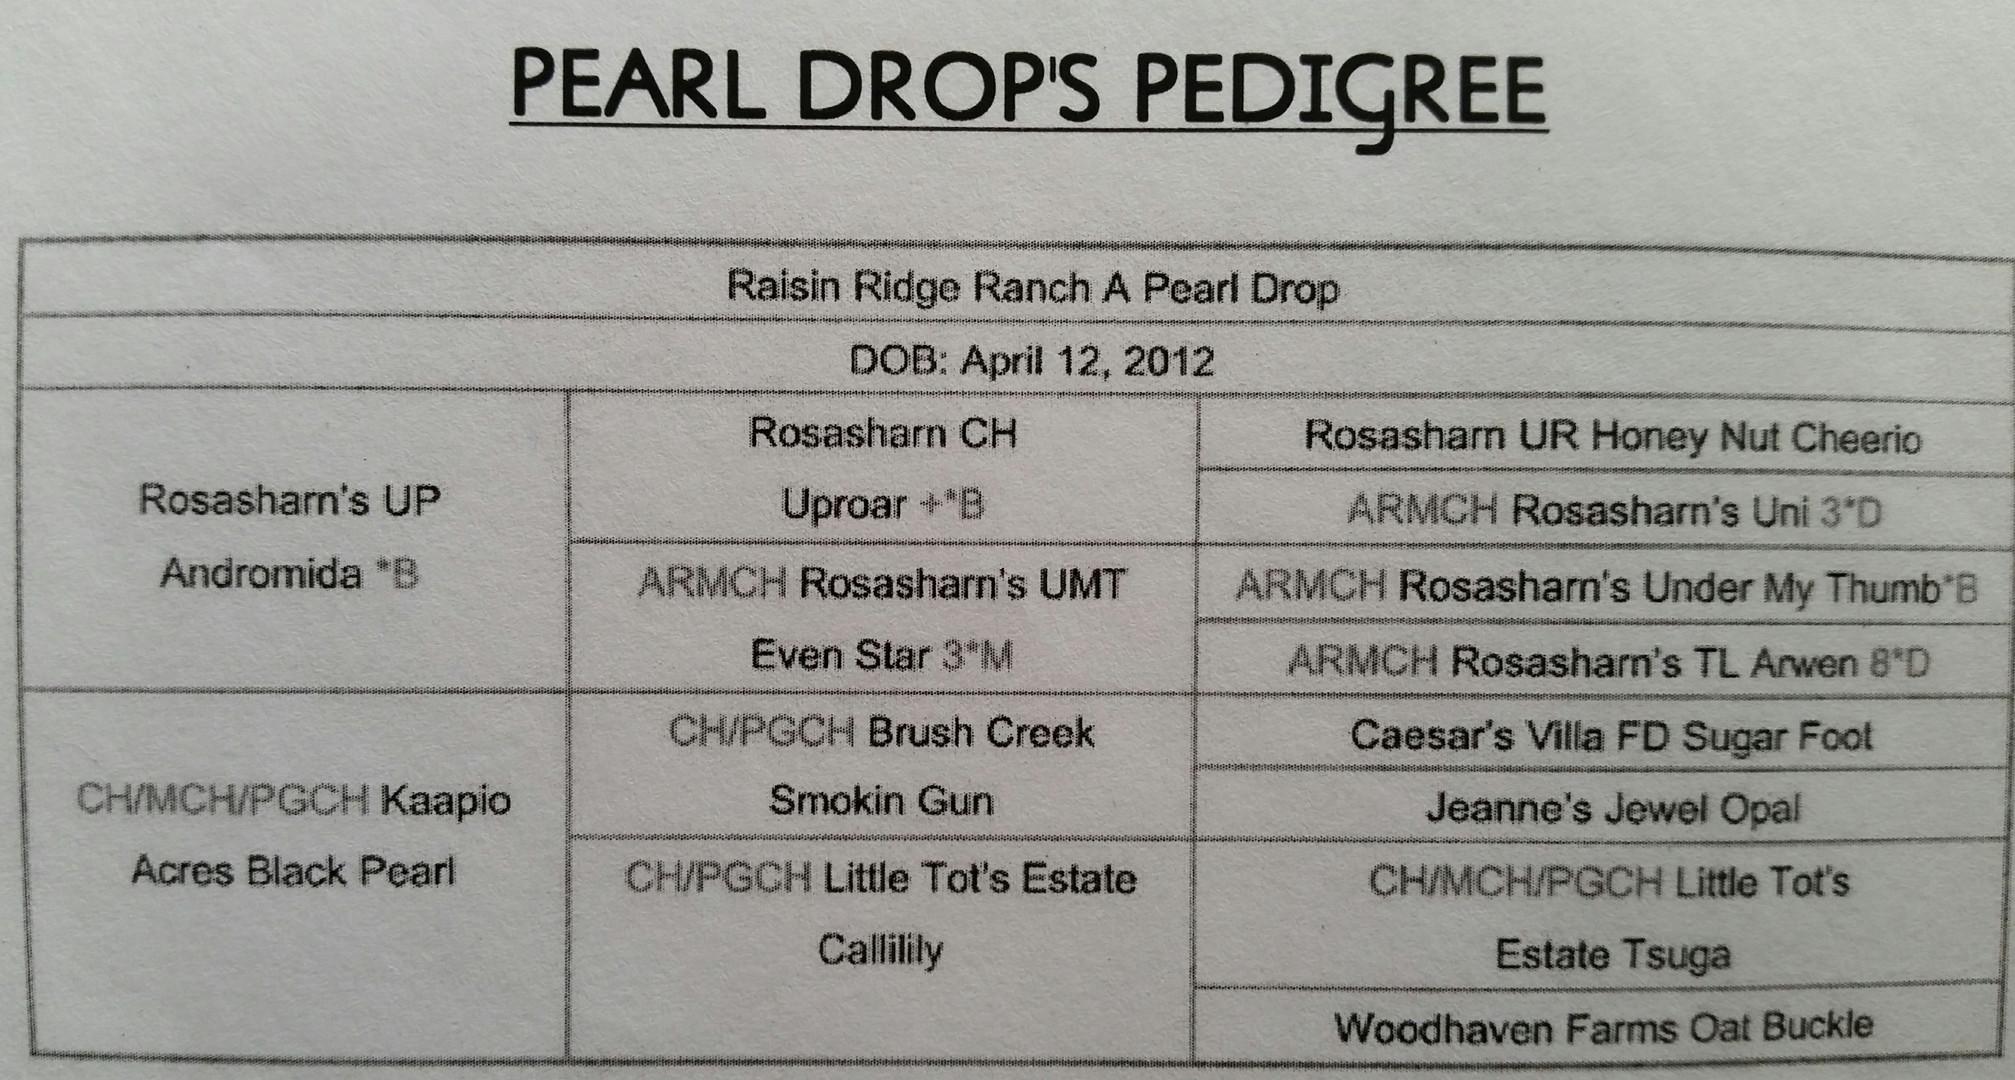 pearl drop pedigree.jpg